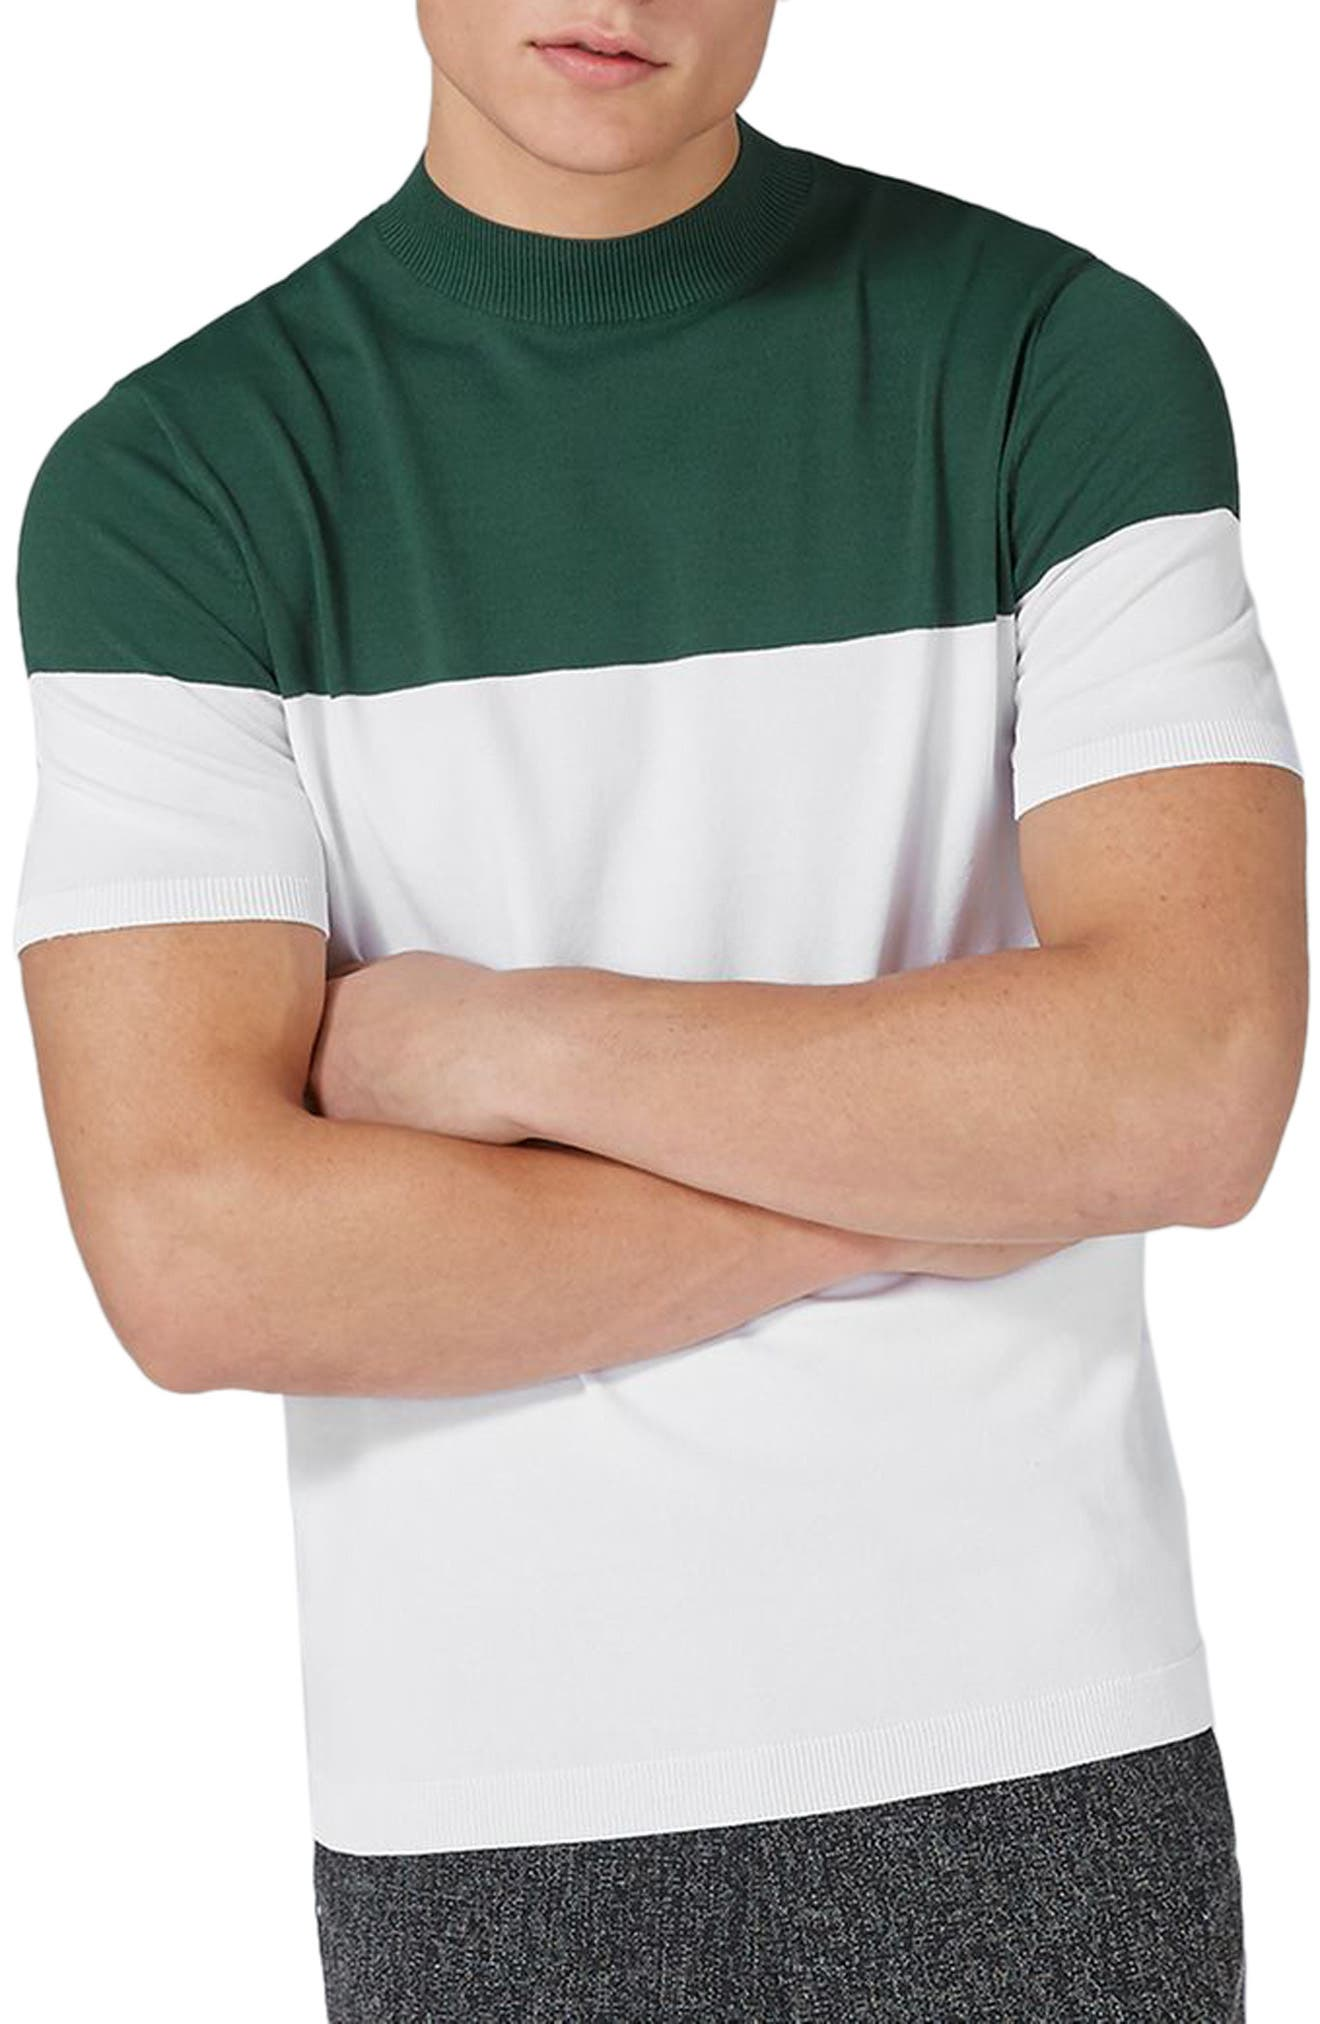 Topman Colorblock Mock Neck Sweater